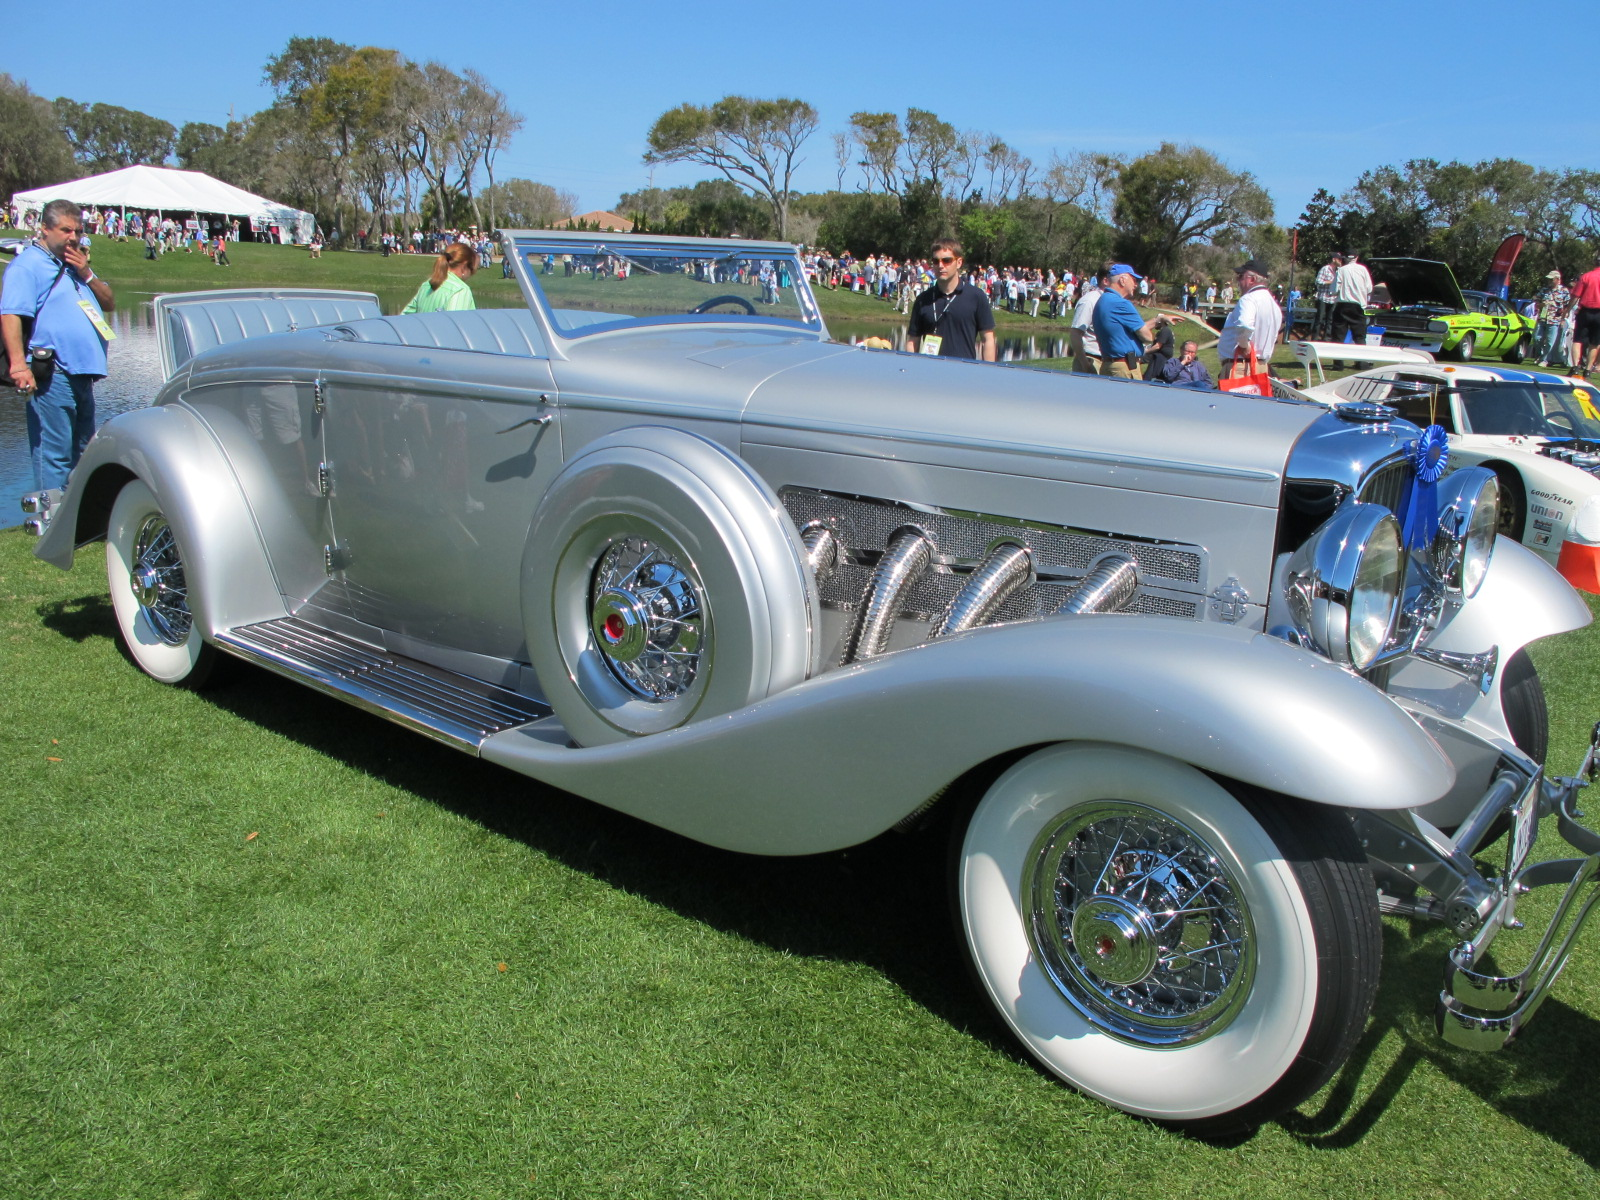 Amelia Island Car Show